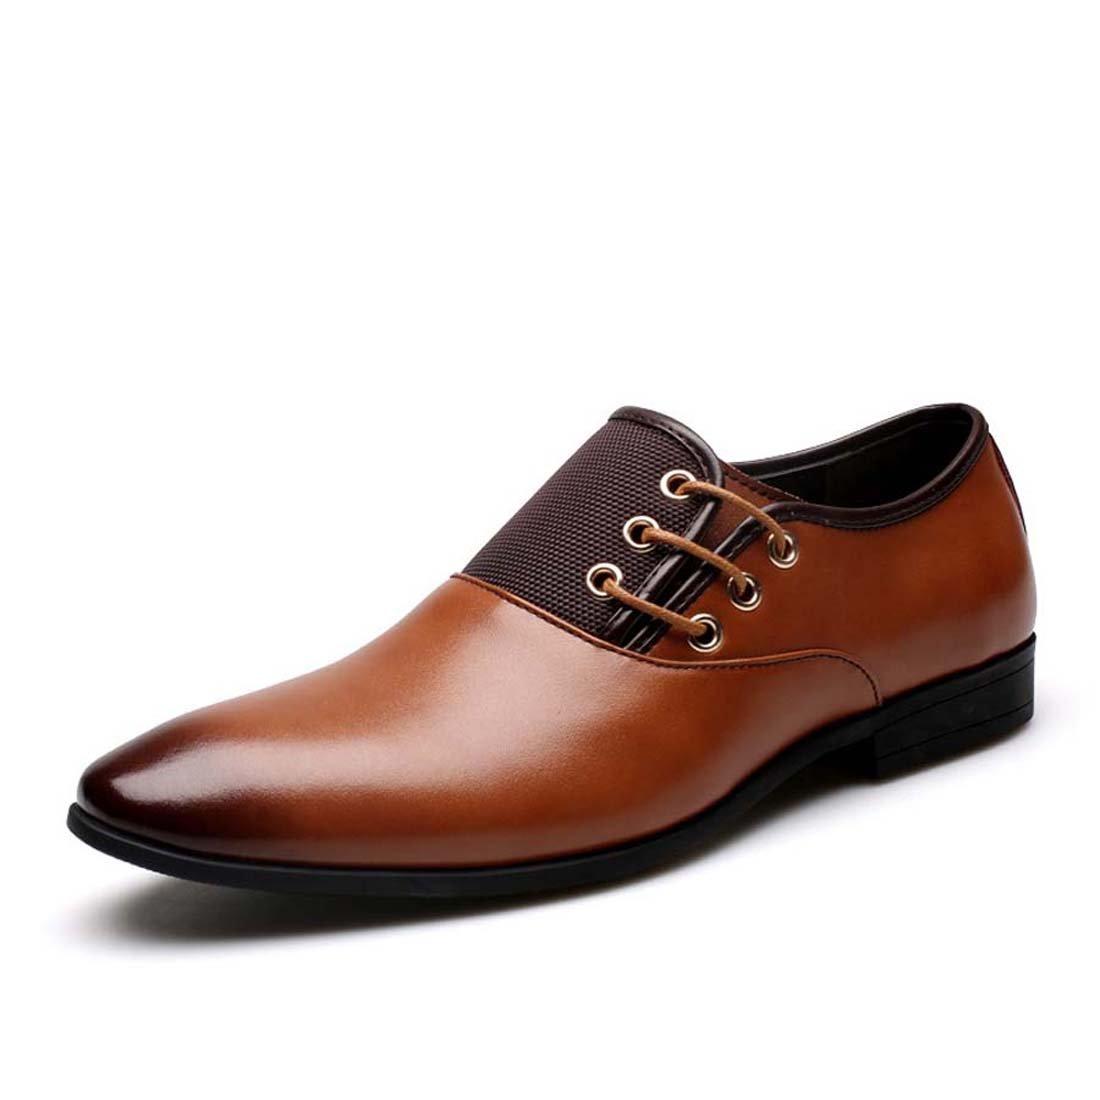 WENJHEN Mens Business Casual Dress Formal Shoes Ningbo Hengwenzheng E-Commerce Co. Ltd